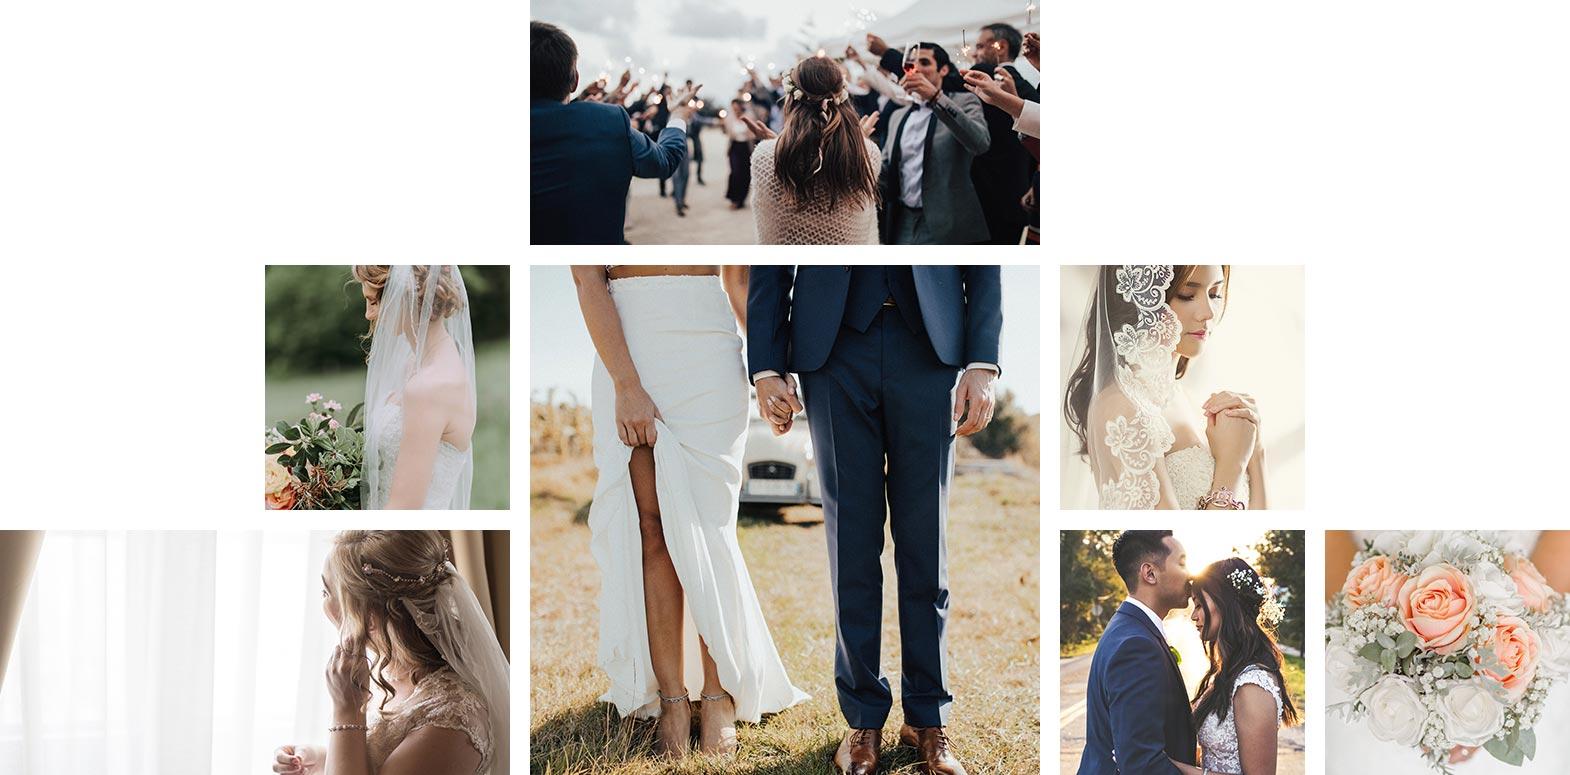 weddingphotos-pic1